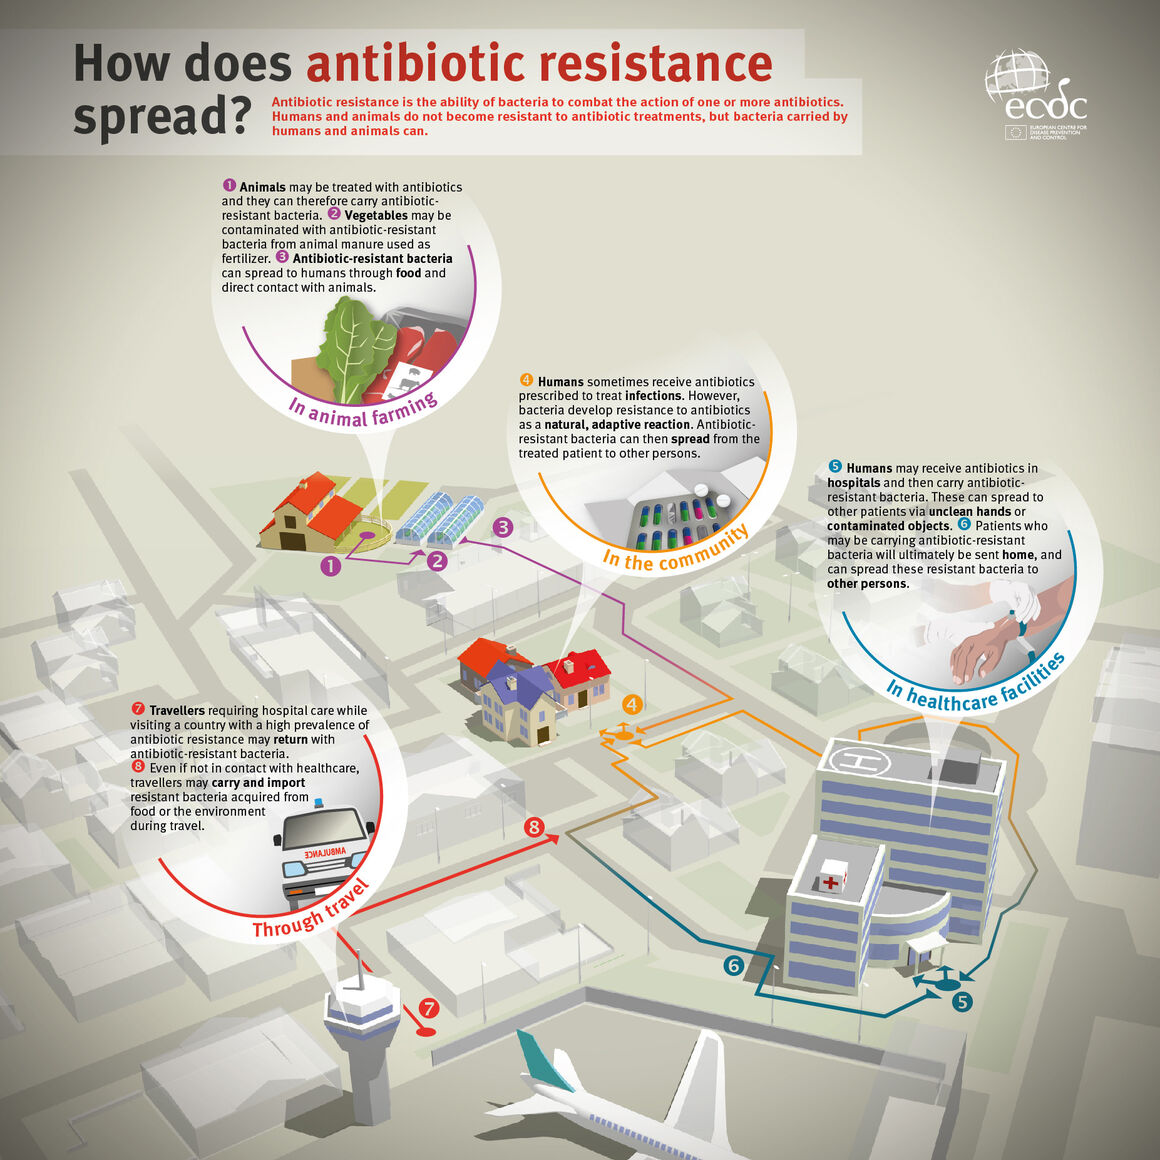 Infographic explaining how antibiotic resistance spreads